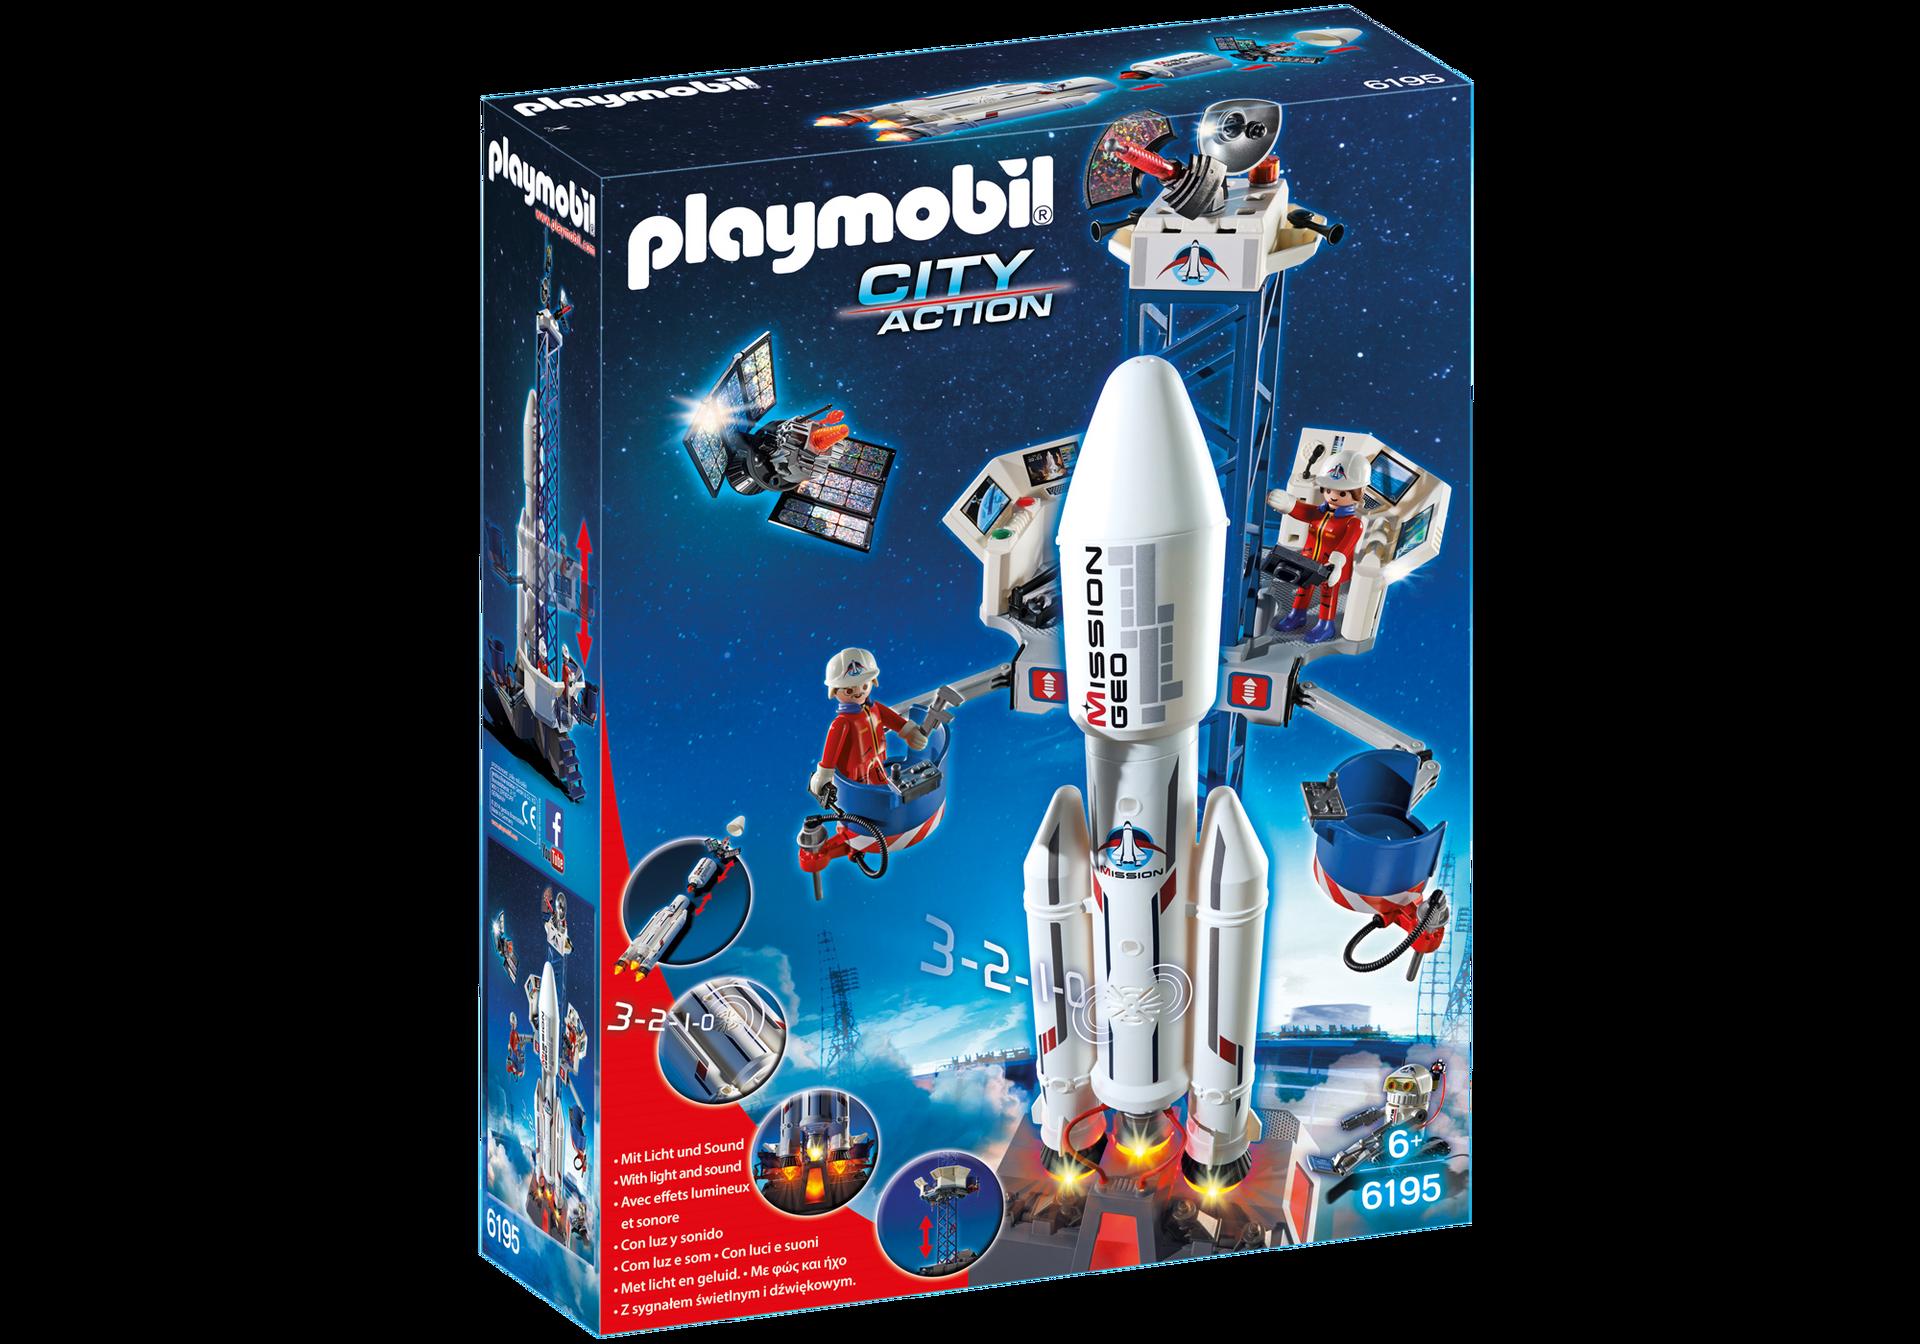 Playmobil Ausmalbilder Shopping Center : 6195 49 99 Space Rocket With Launch Site Elise Playmobil Pinterest